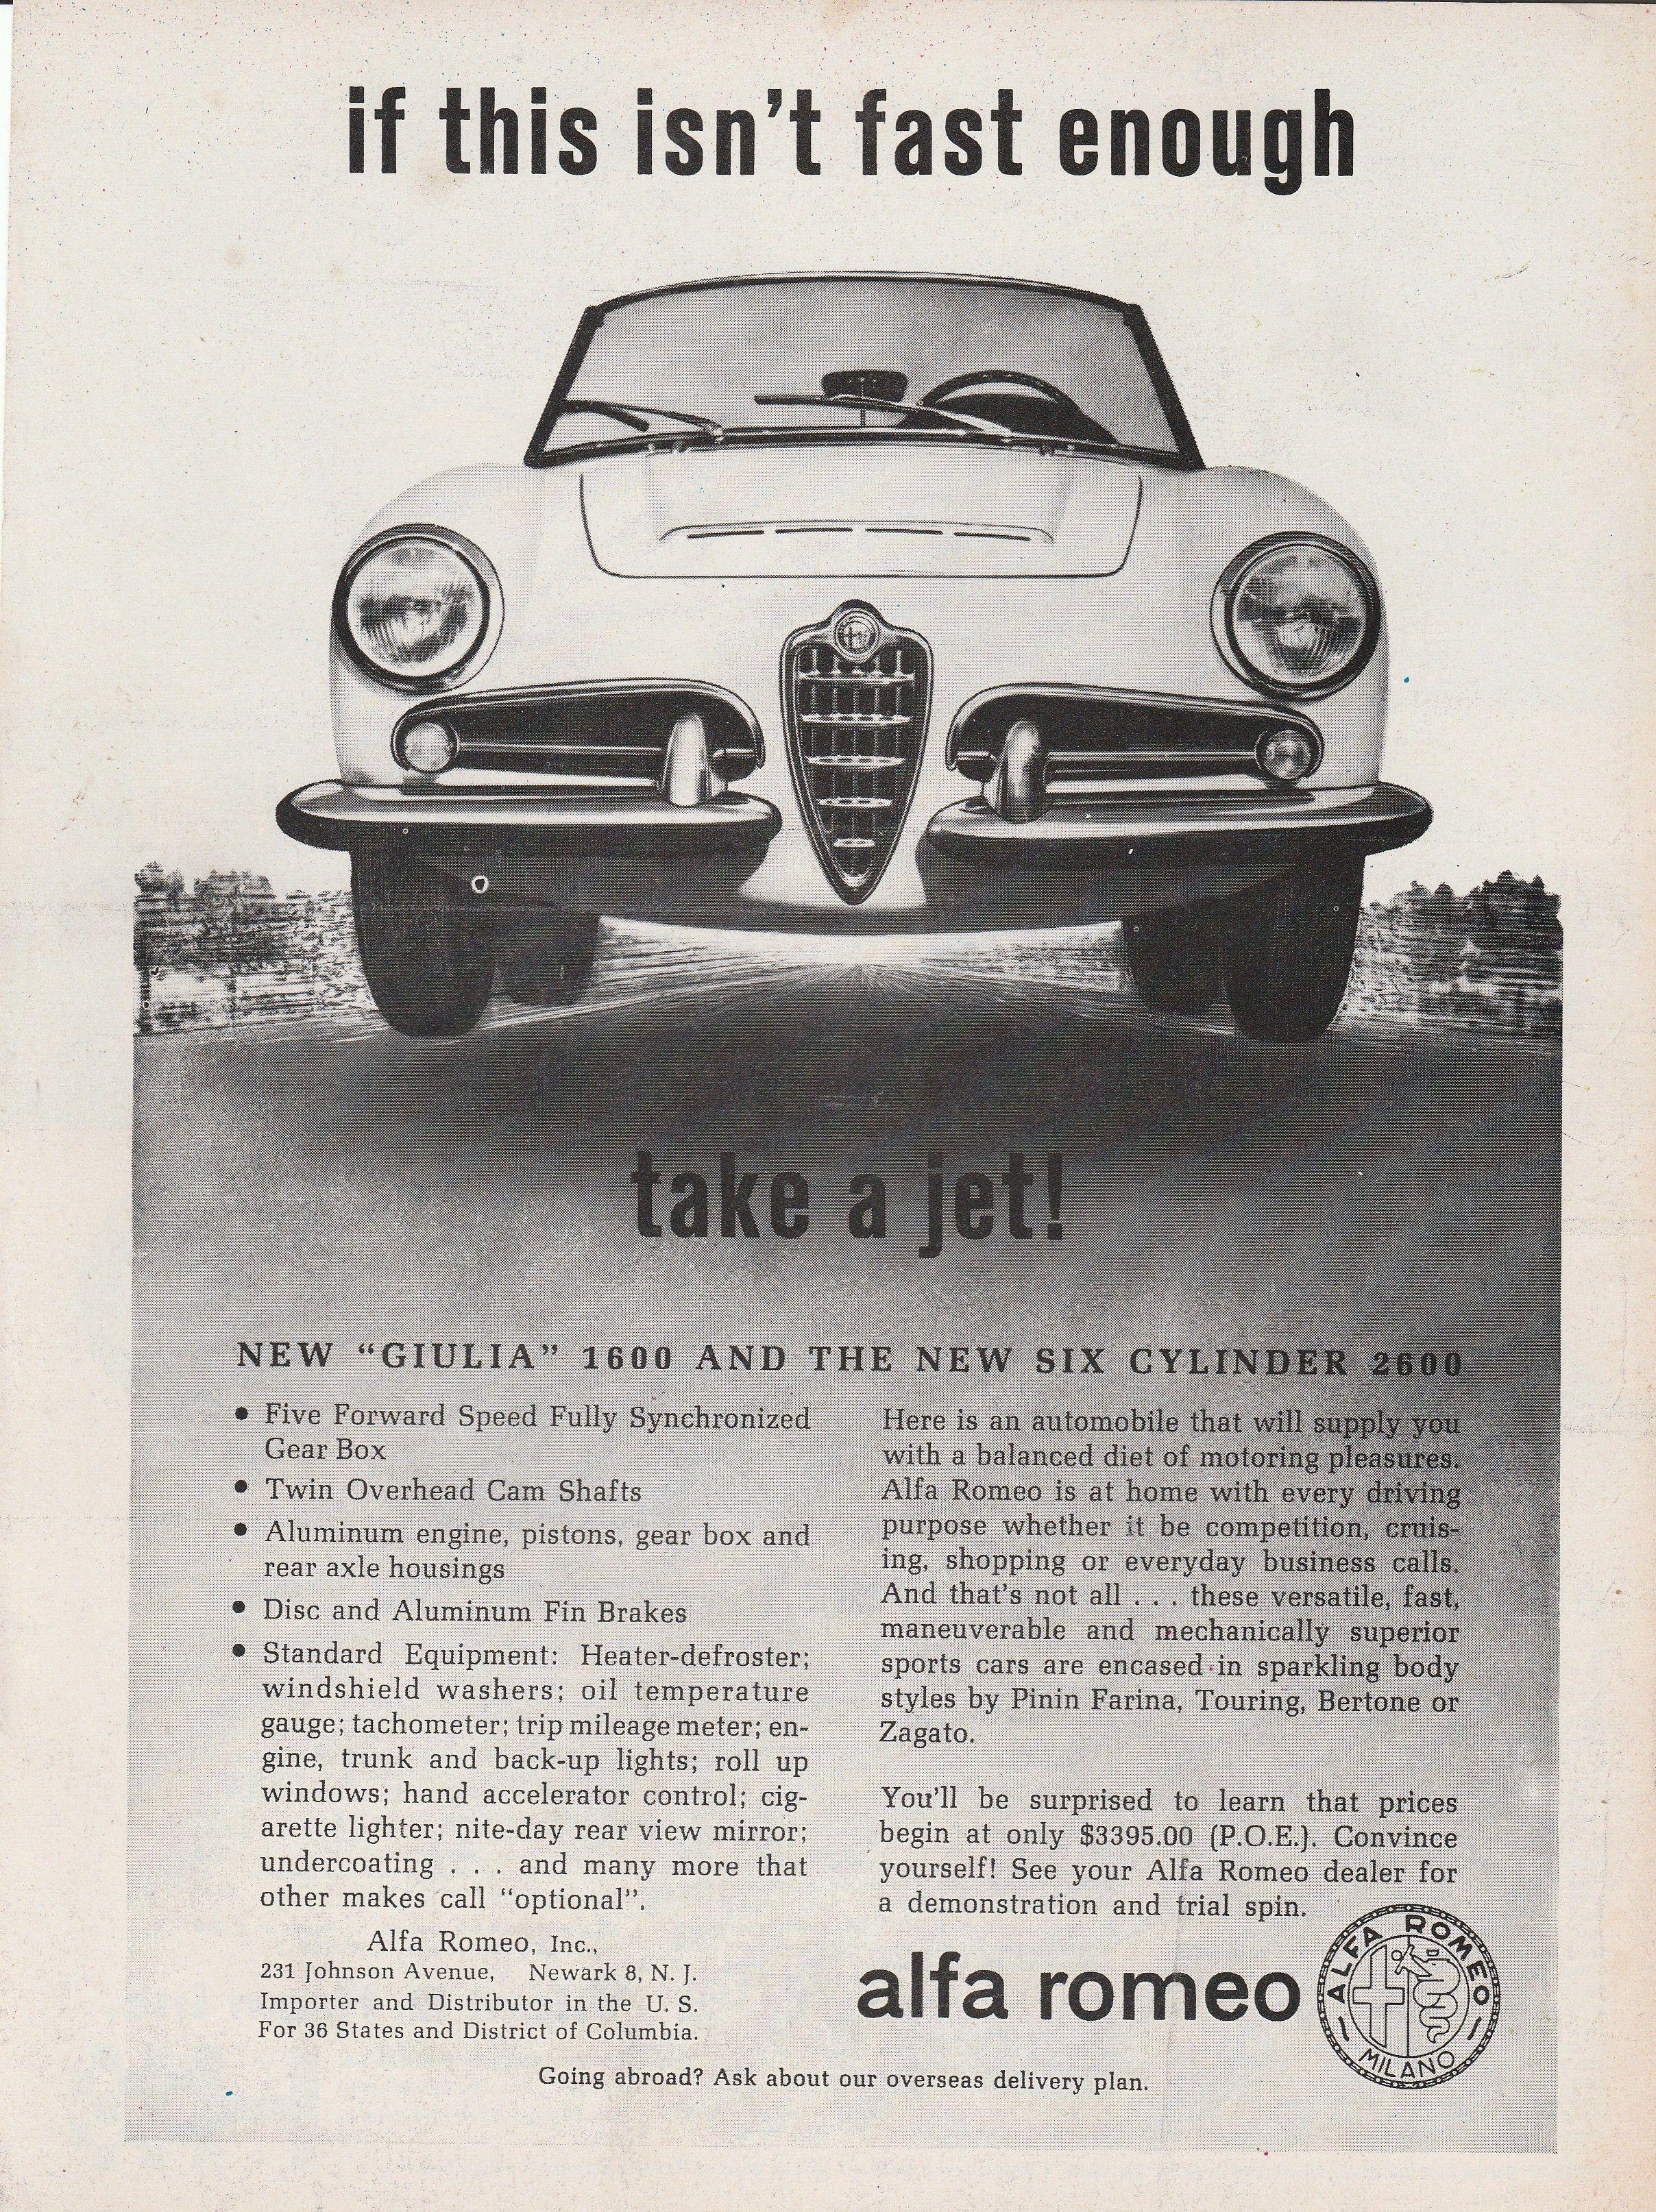 1963 Alfa Romeo If this isn t fast enough take a jet vintage ad